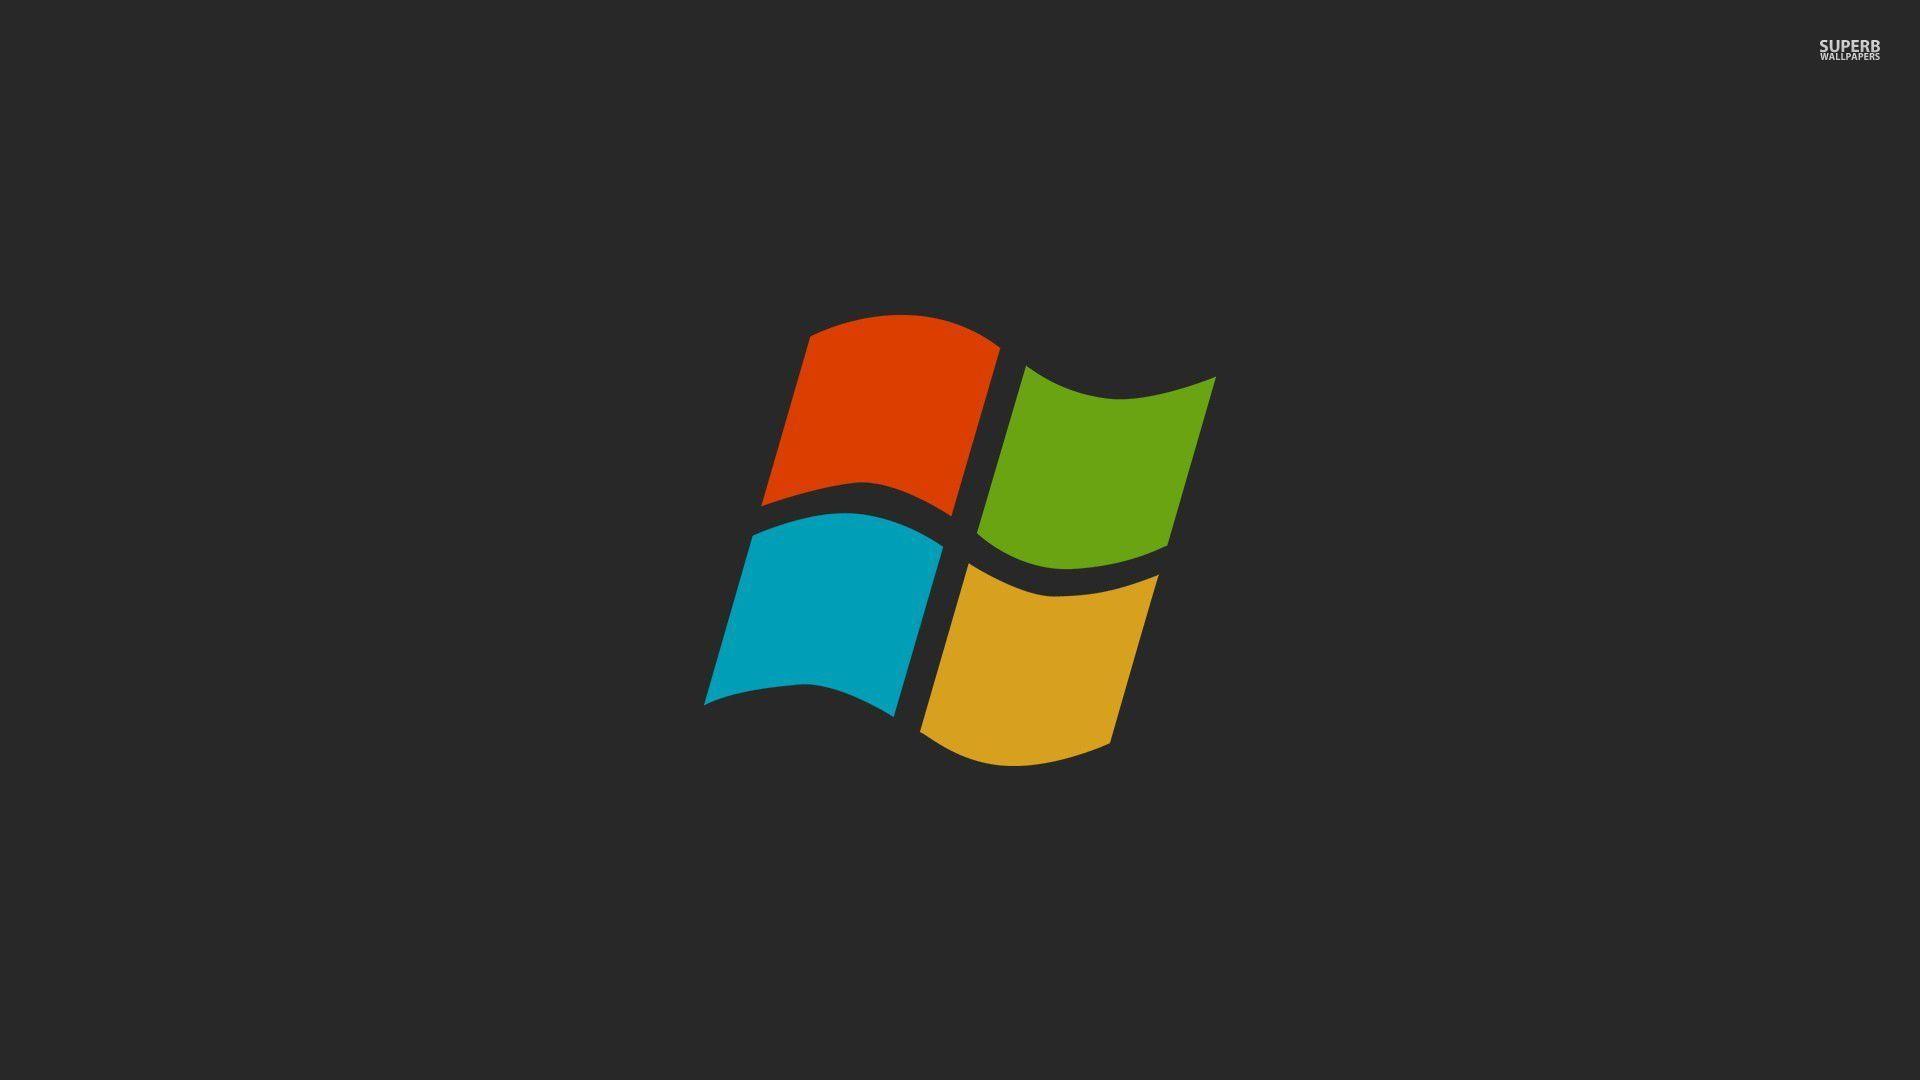 Windows 2016 wallpapers wallpaper cave for Lustige wallpaper